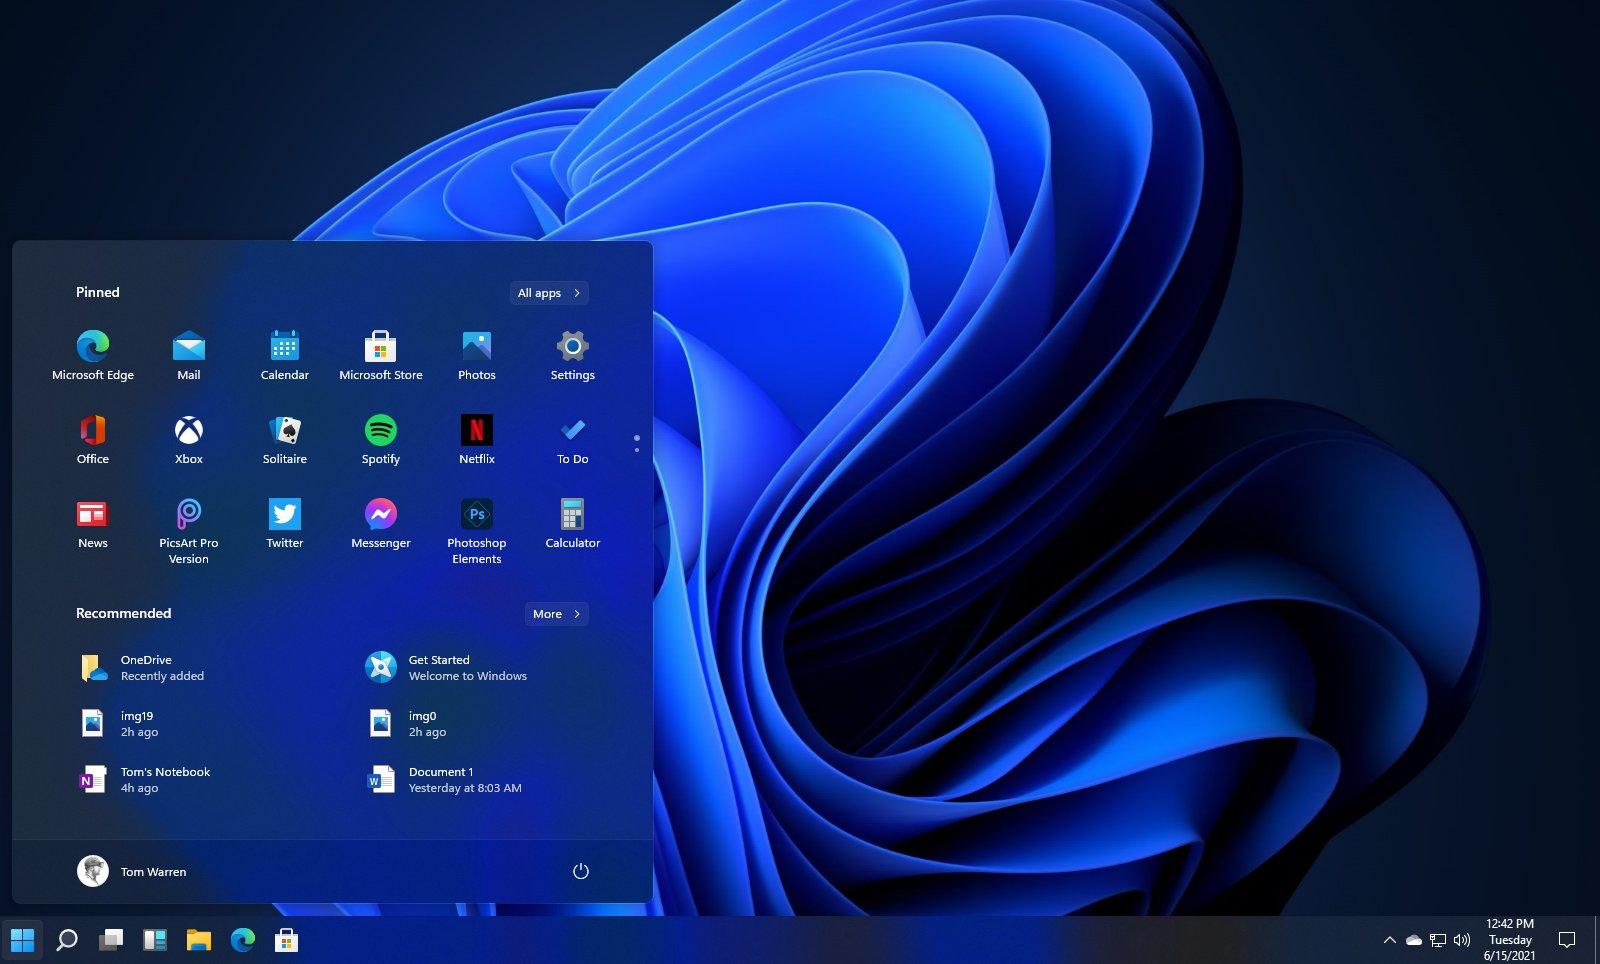 Revamped UI And New Start Menu In Windows 11